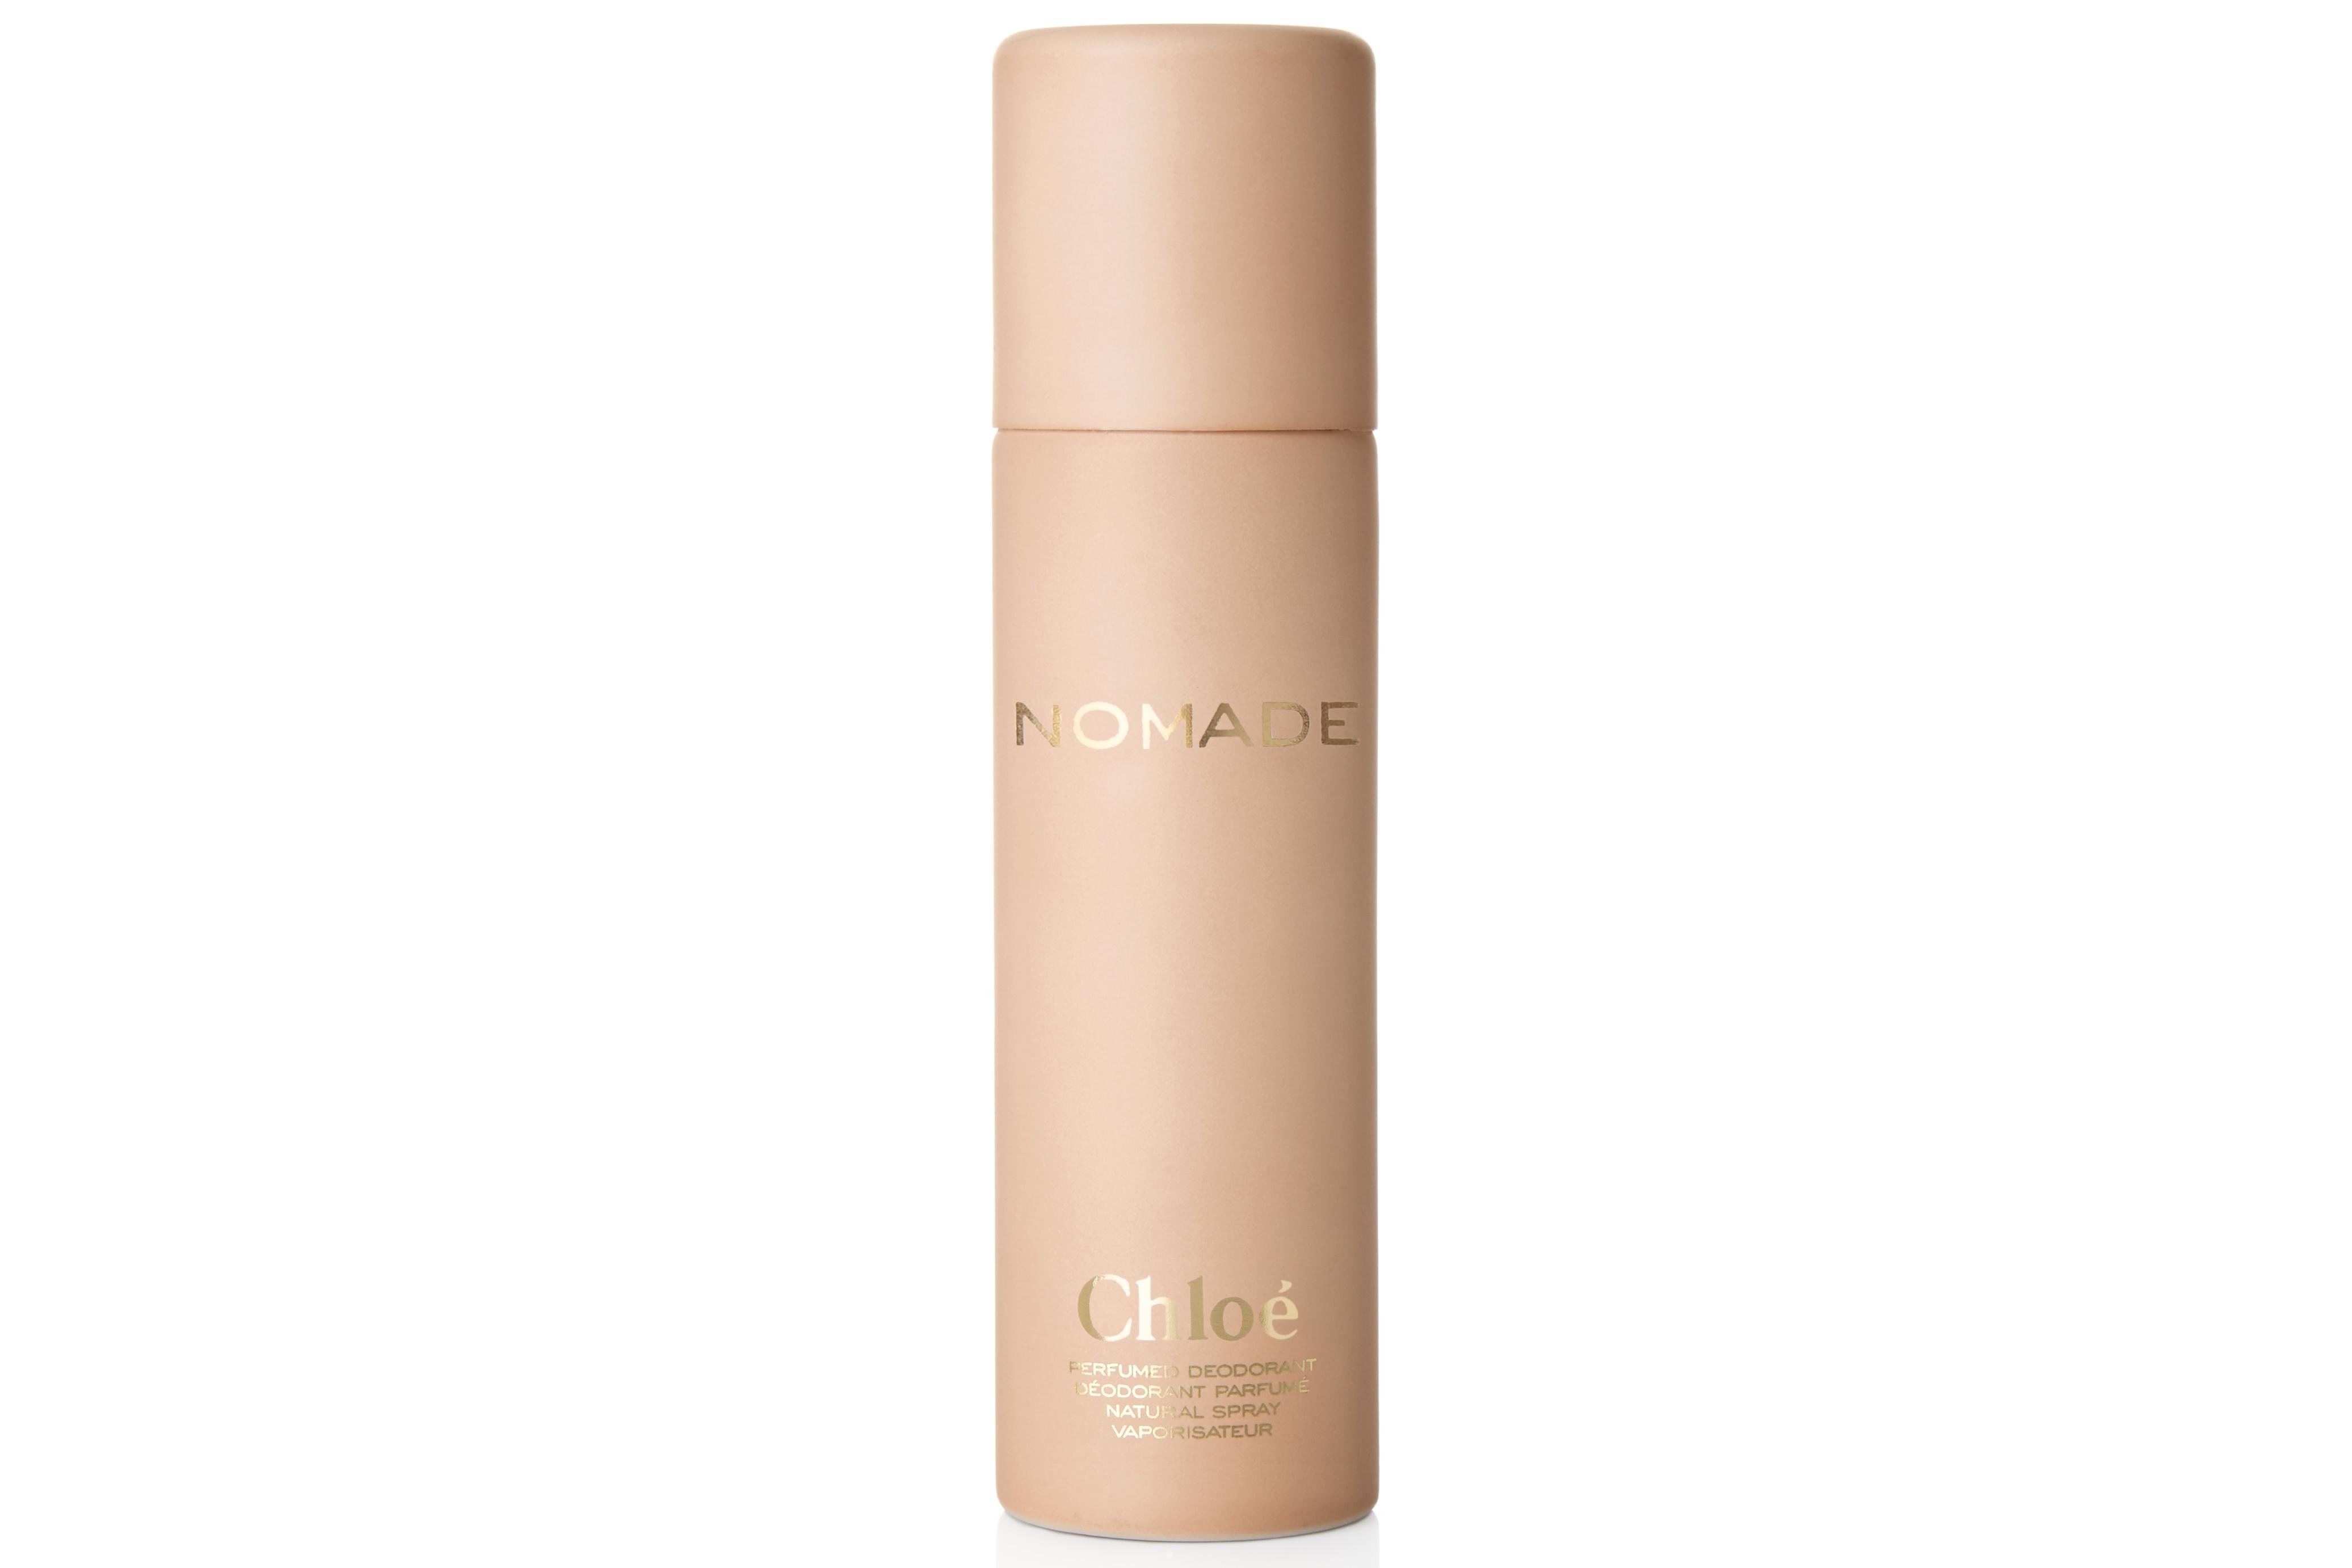 Chloé Nomade Deo Natural Spray, 100 ml